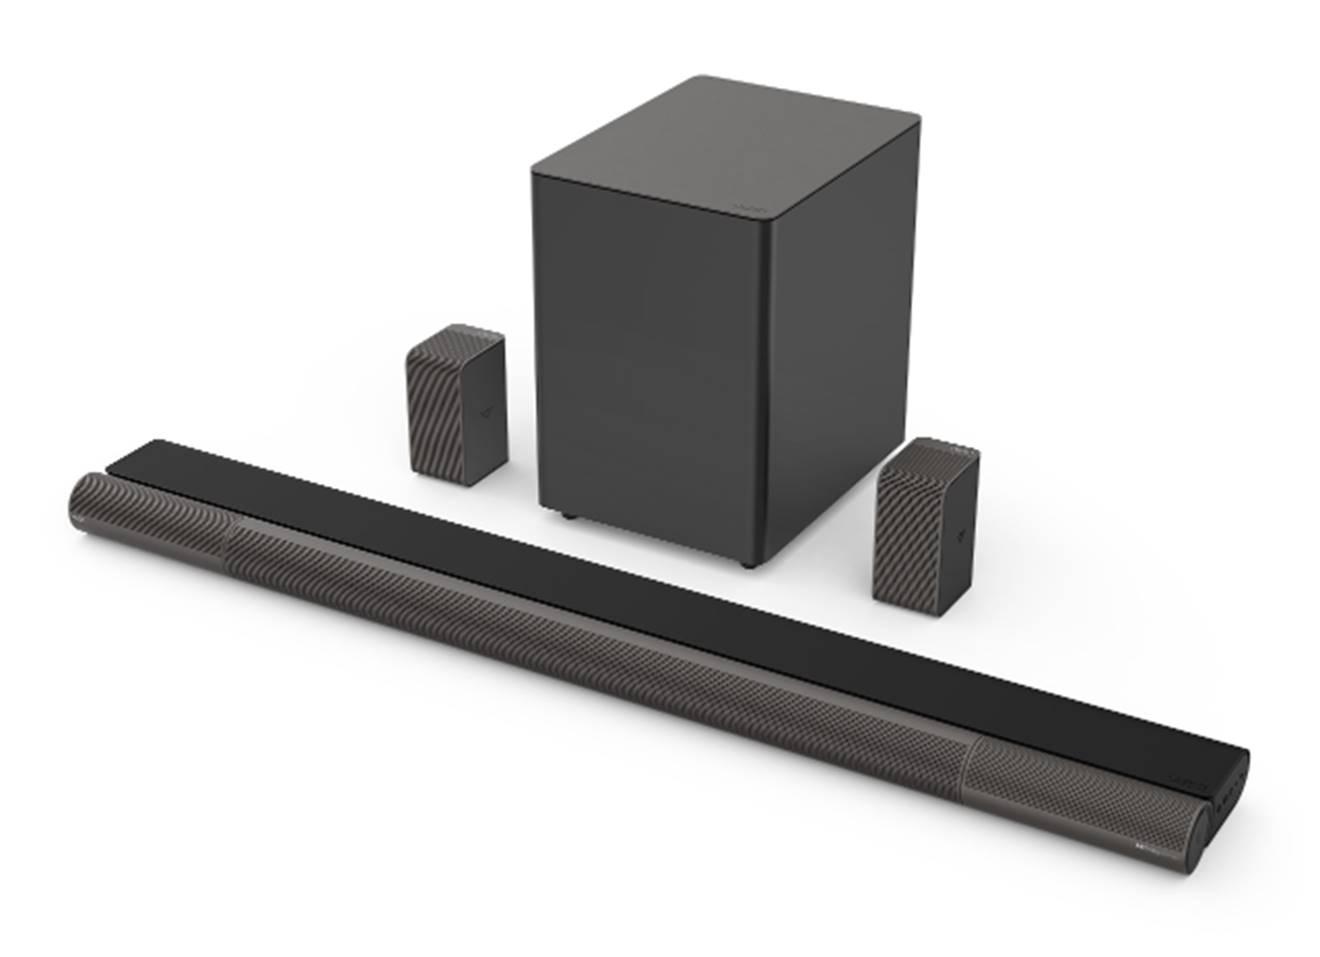 VIZIO Elevate Sound Bar Home Theater System